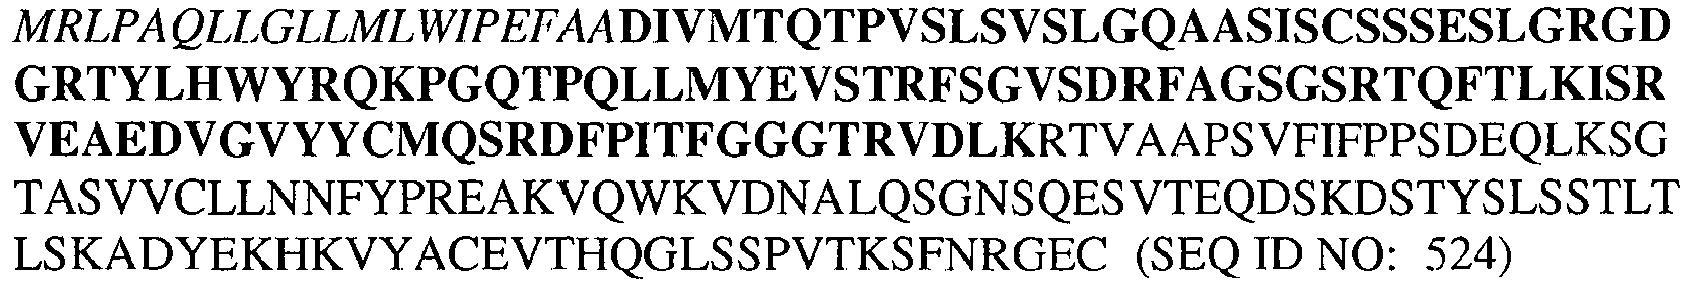 Figure imgb0389